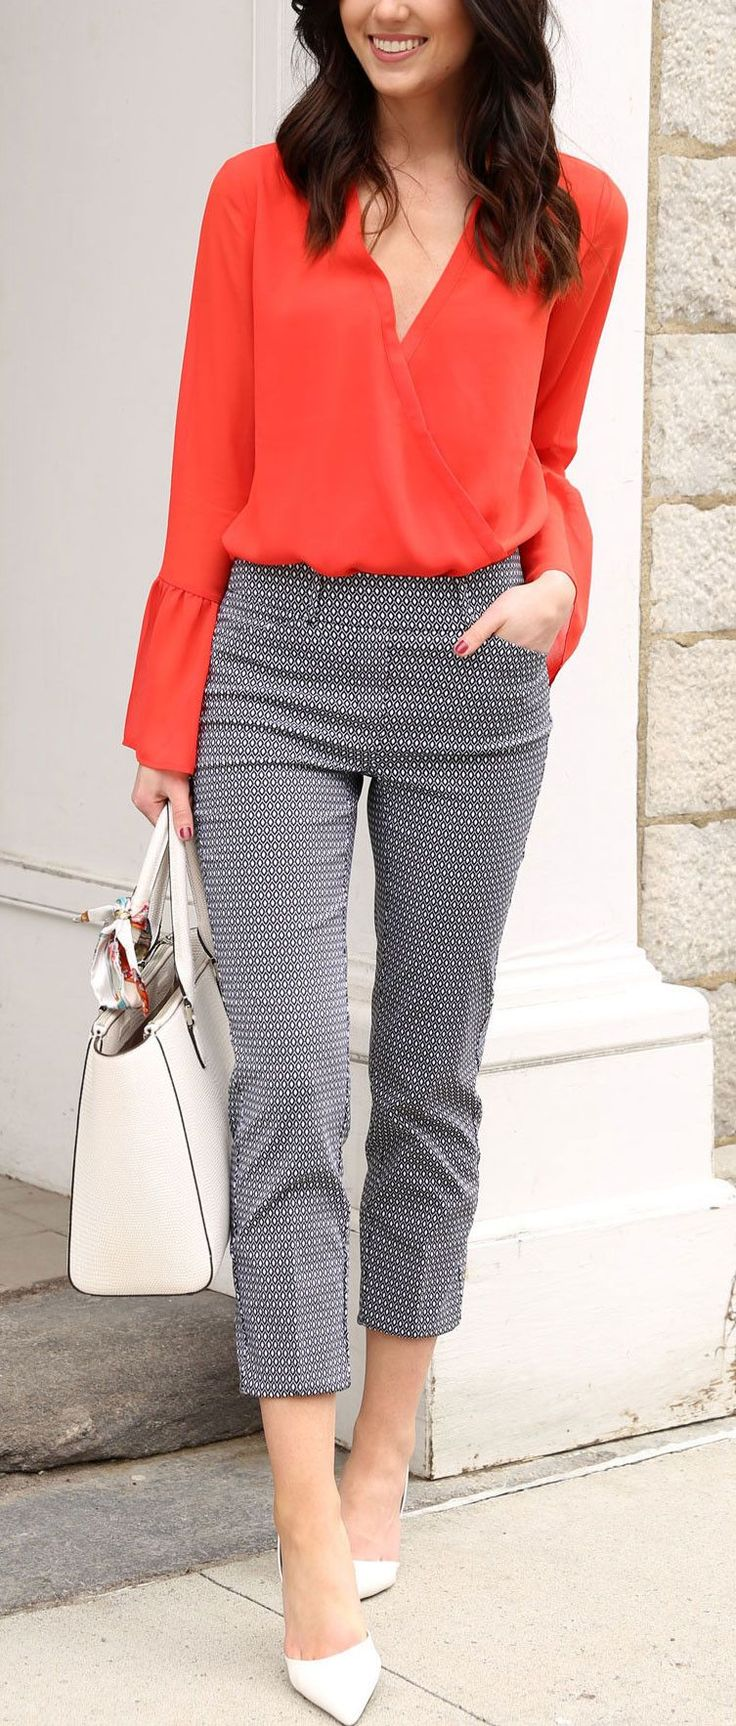 #winter #outfits Camisa de manga larga naranja sobrepelliz, pantalones capri grises, sandalias de punta blanca y bolso de cuero blanco #womenclothingwinter